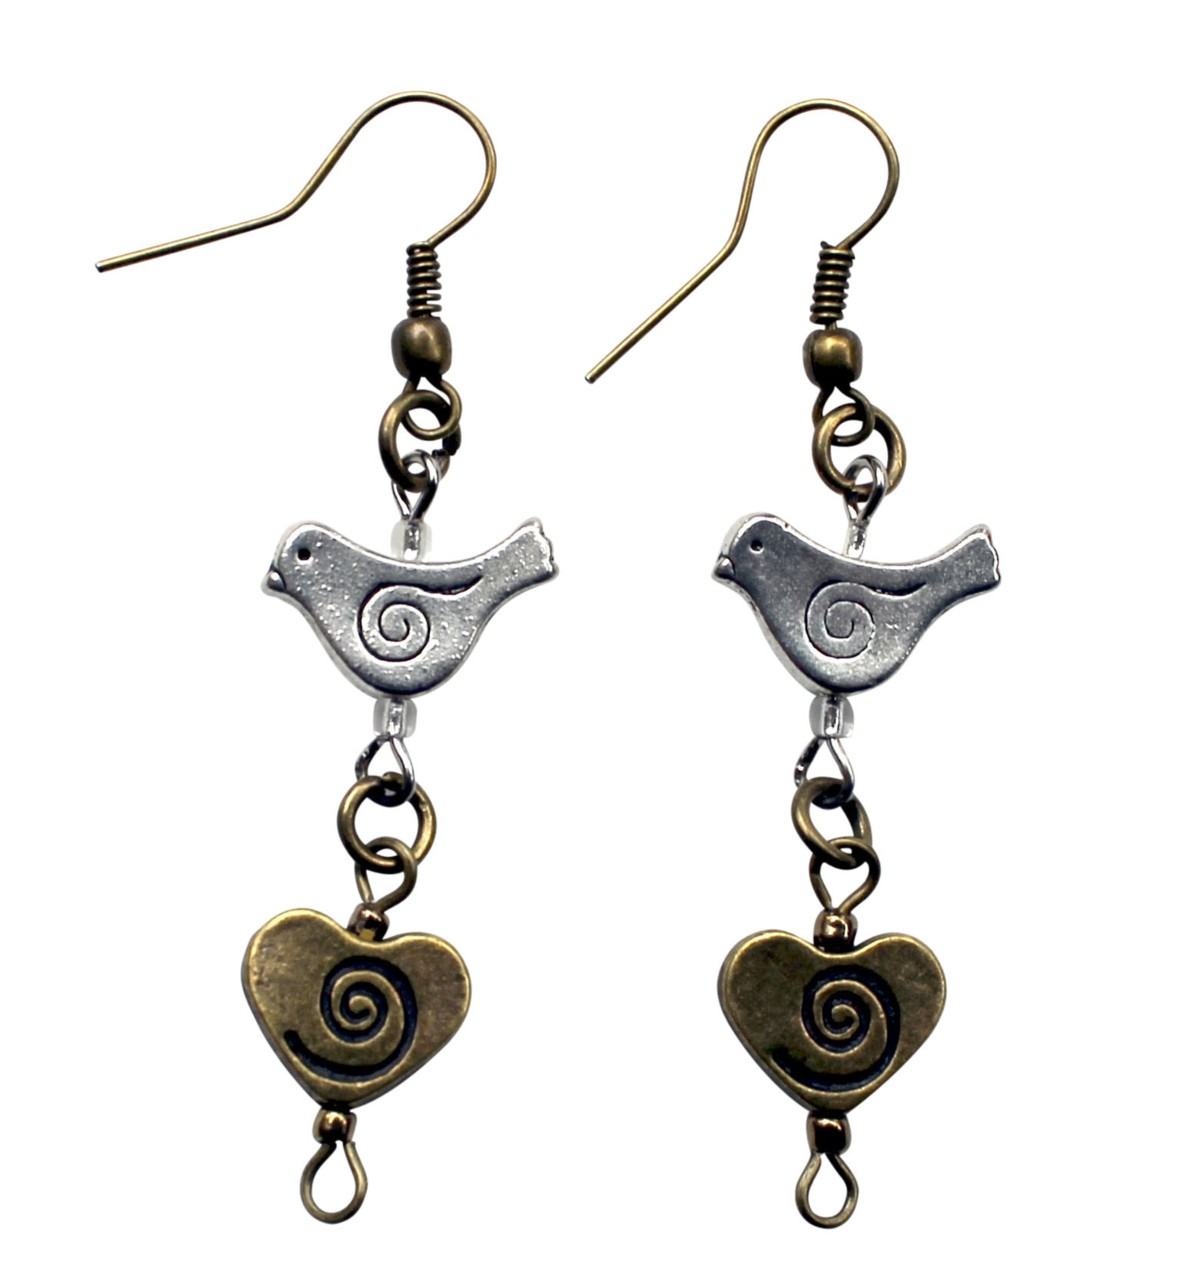 Handmade and Fair Trade Earrings